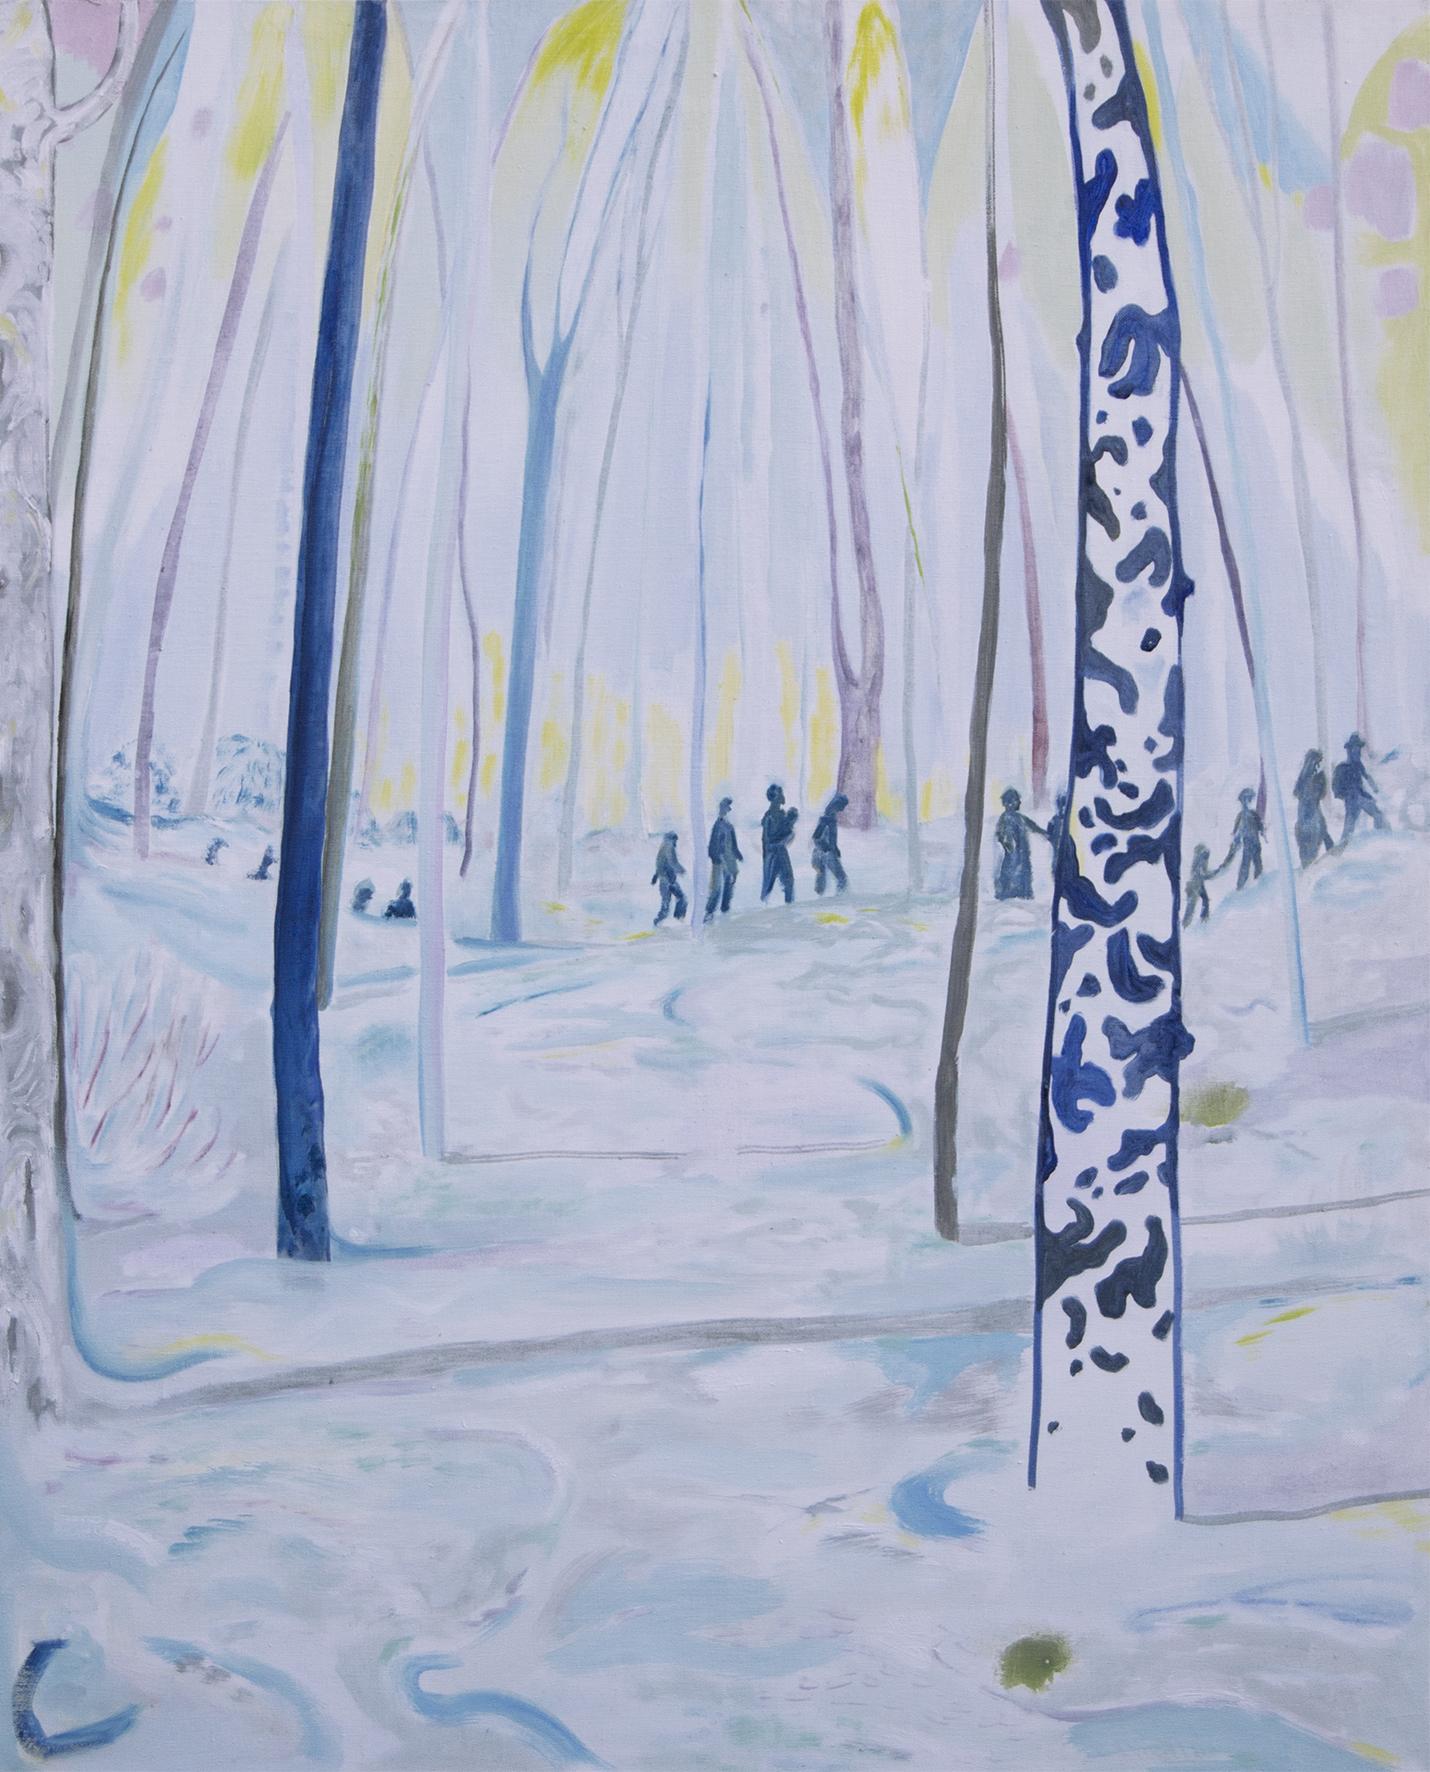 Vera Portatadino, The Forest Crossing, 2017, oil on linen,120 x 100 cm